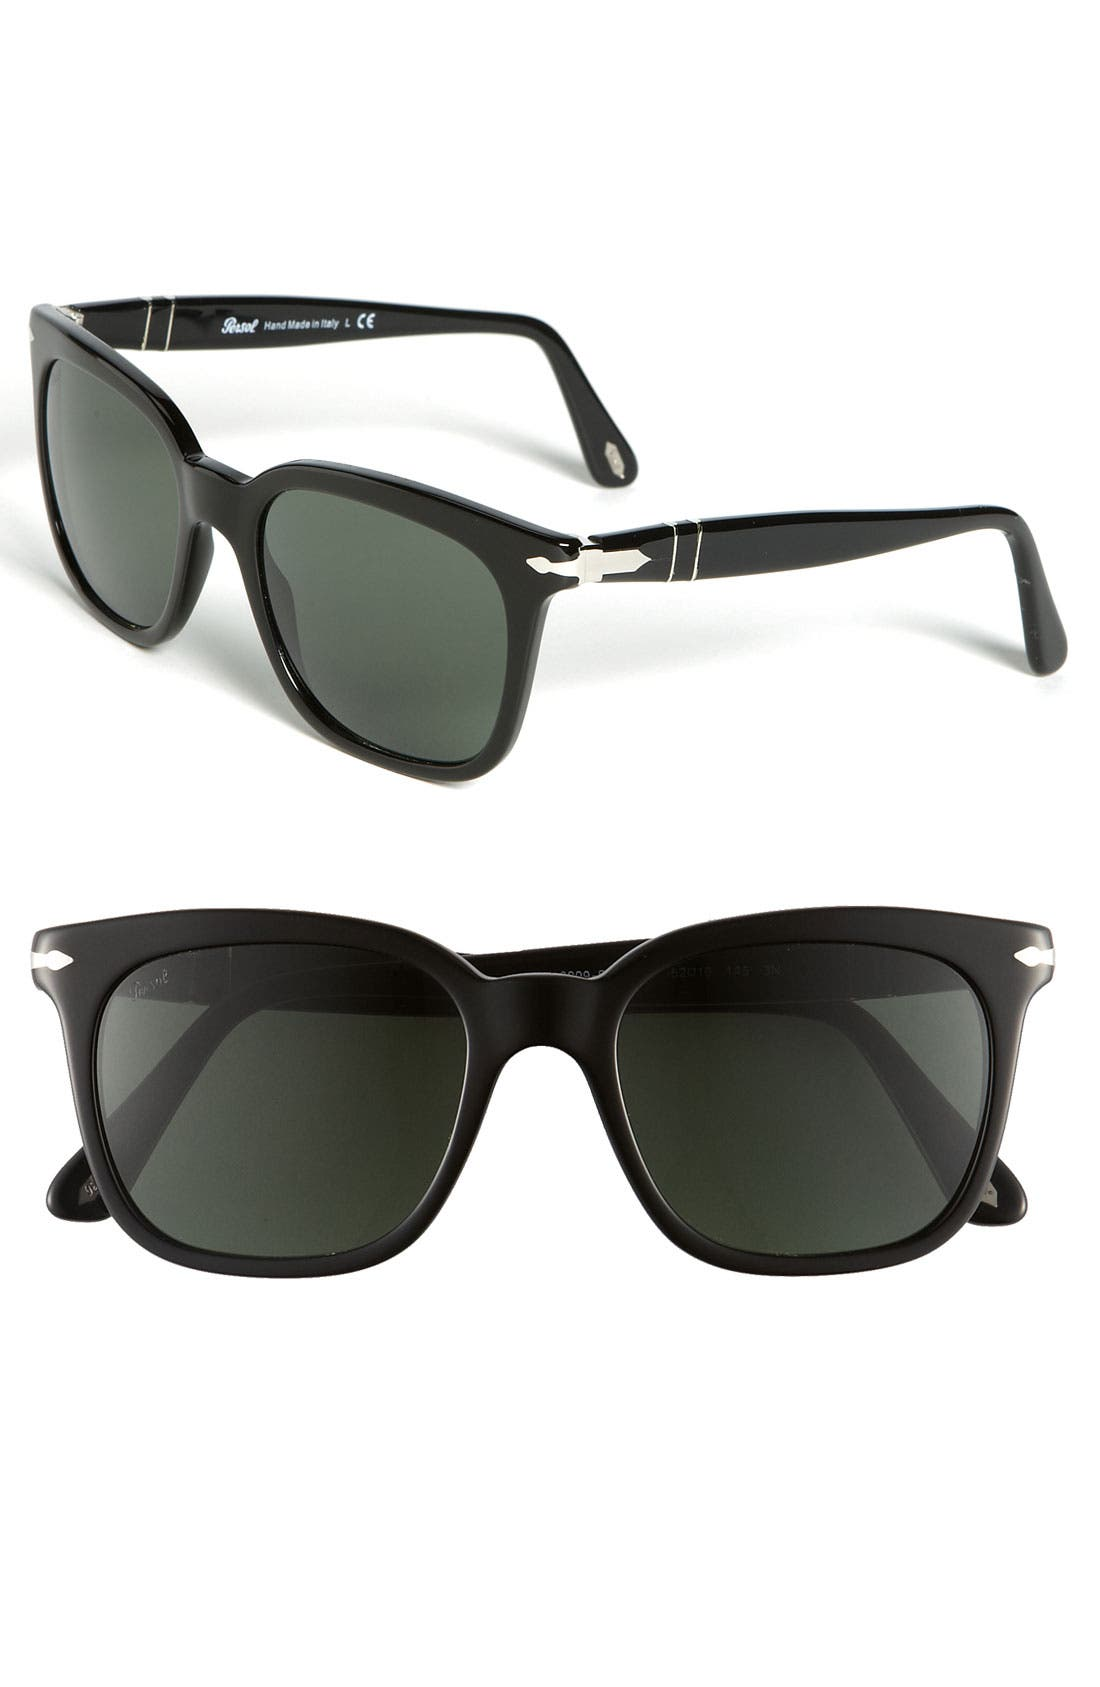 Main Image - Persol 50mm Square Vintage Sunglasses